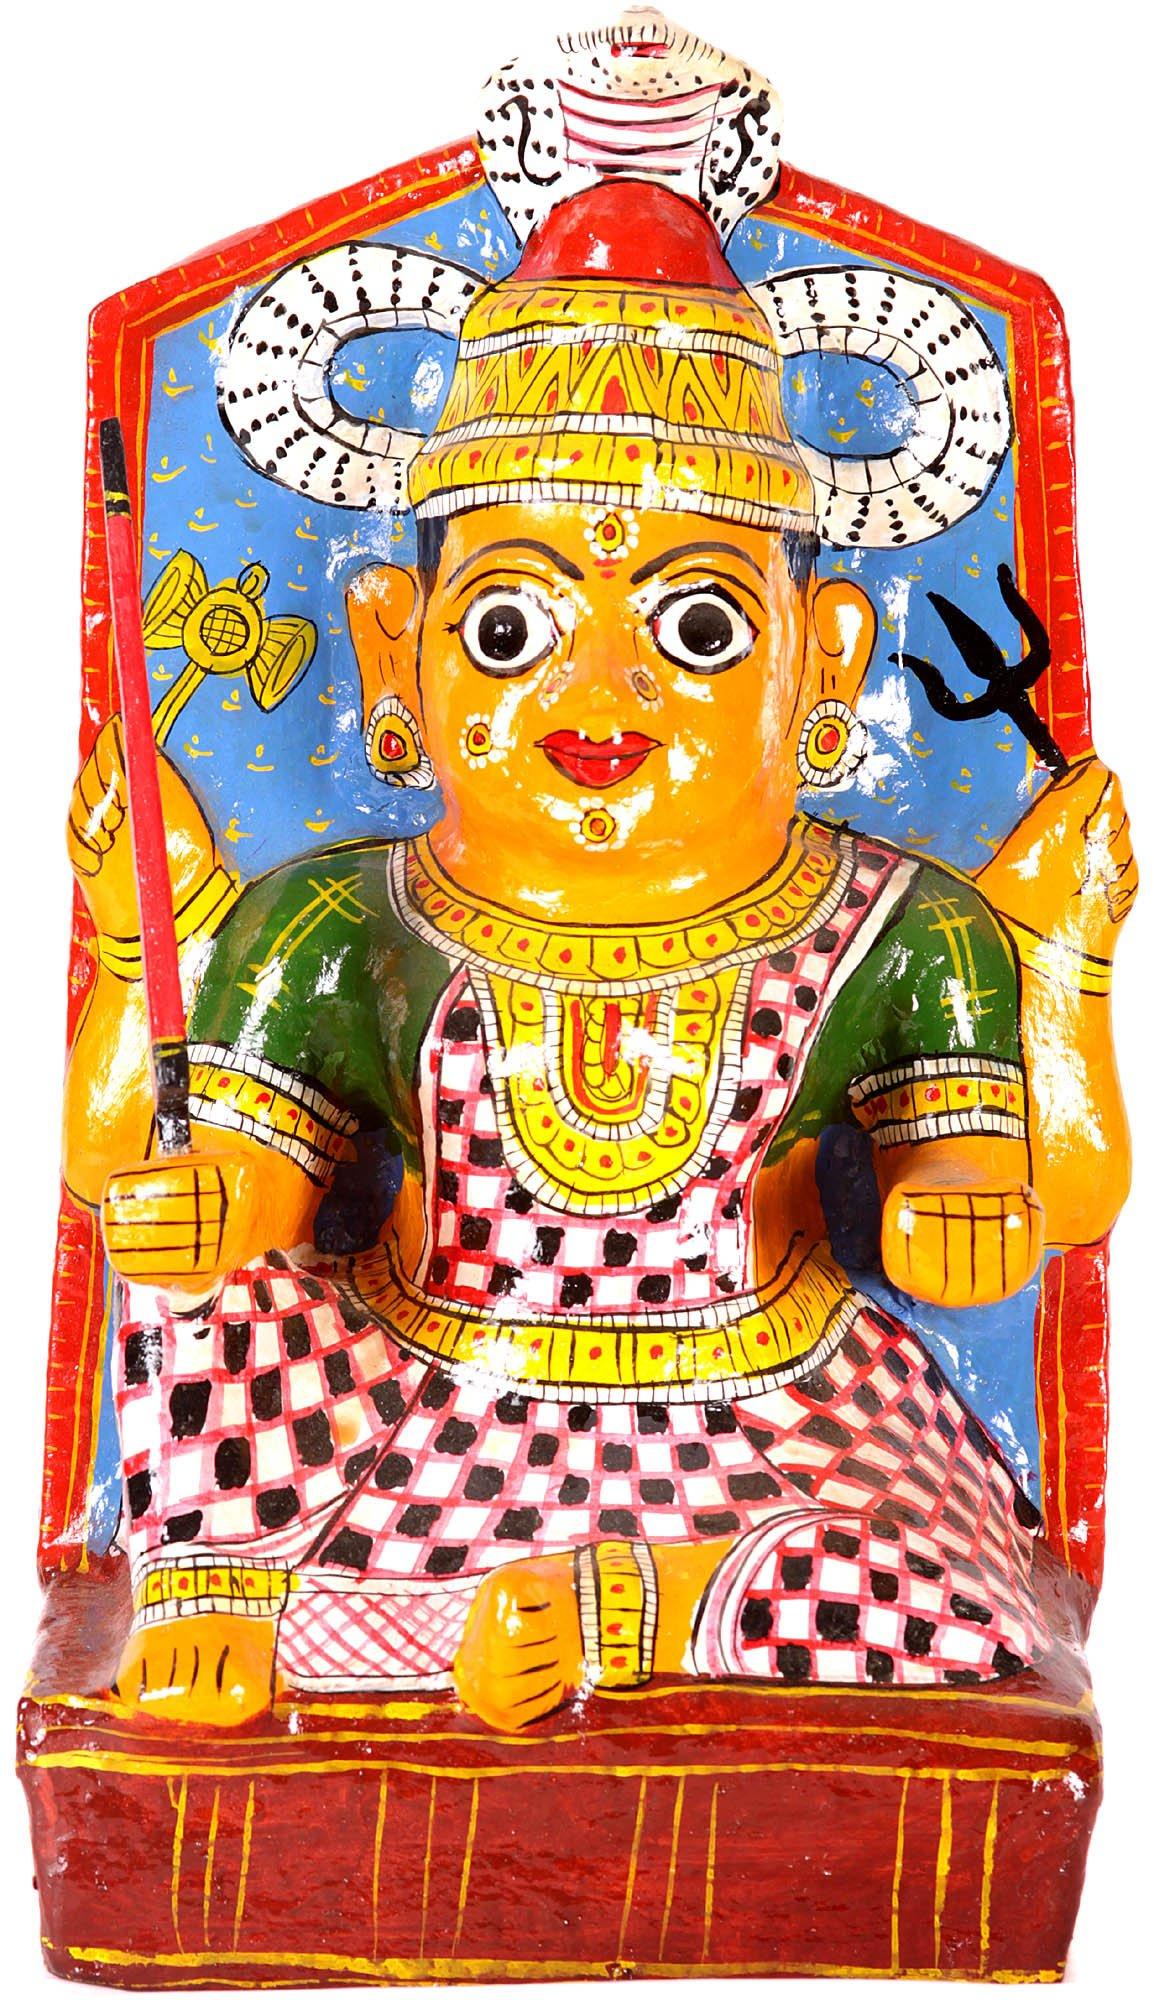 Yellamma Gangamma (Andhra Pradesh) - Papier Machie and Polychrome